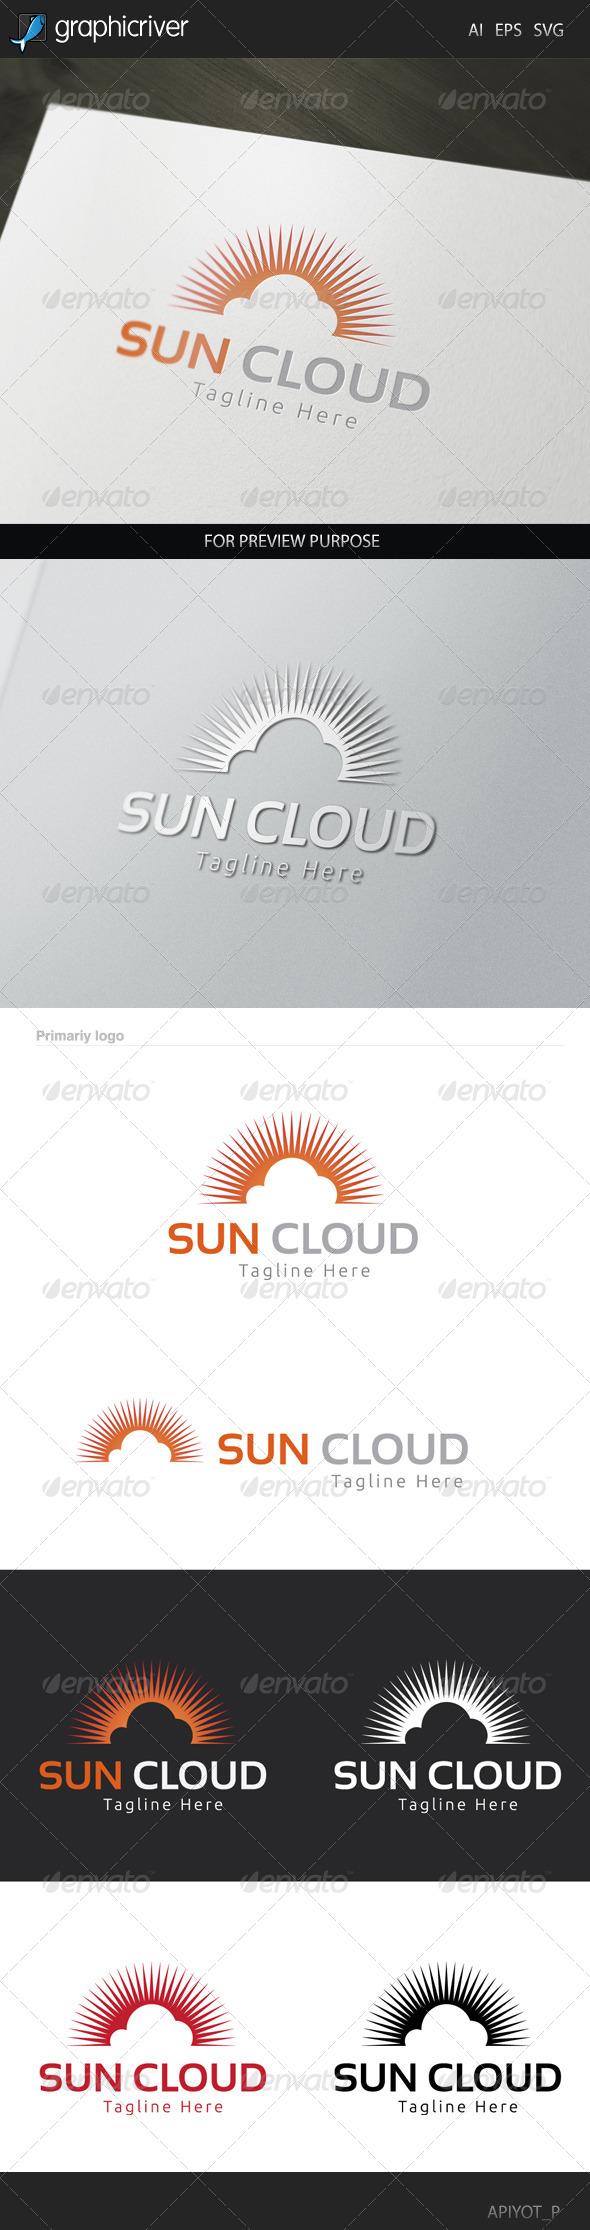 GraphicRiver Sun Cloud Logo 8320026